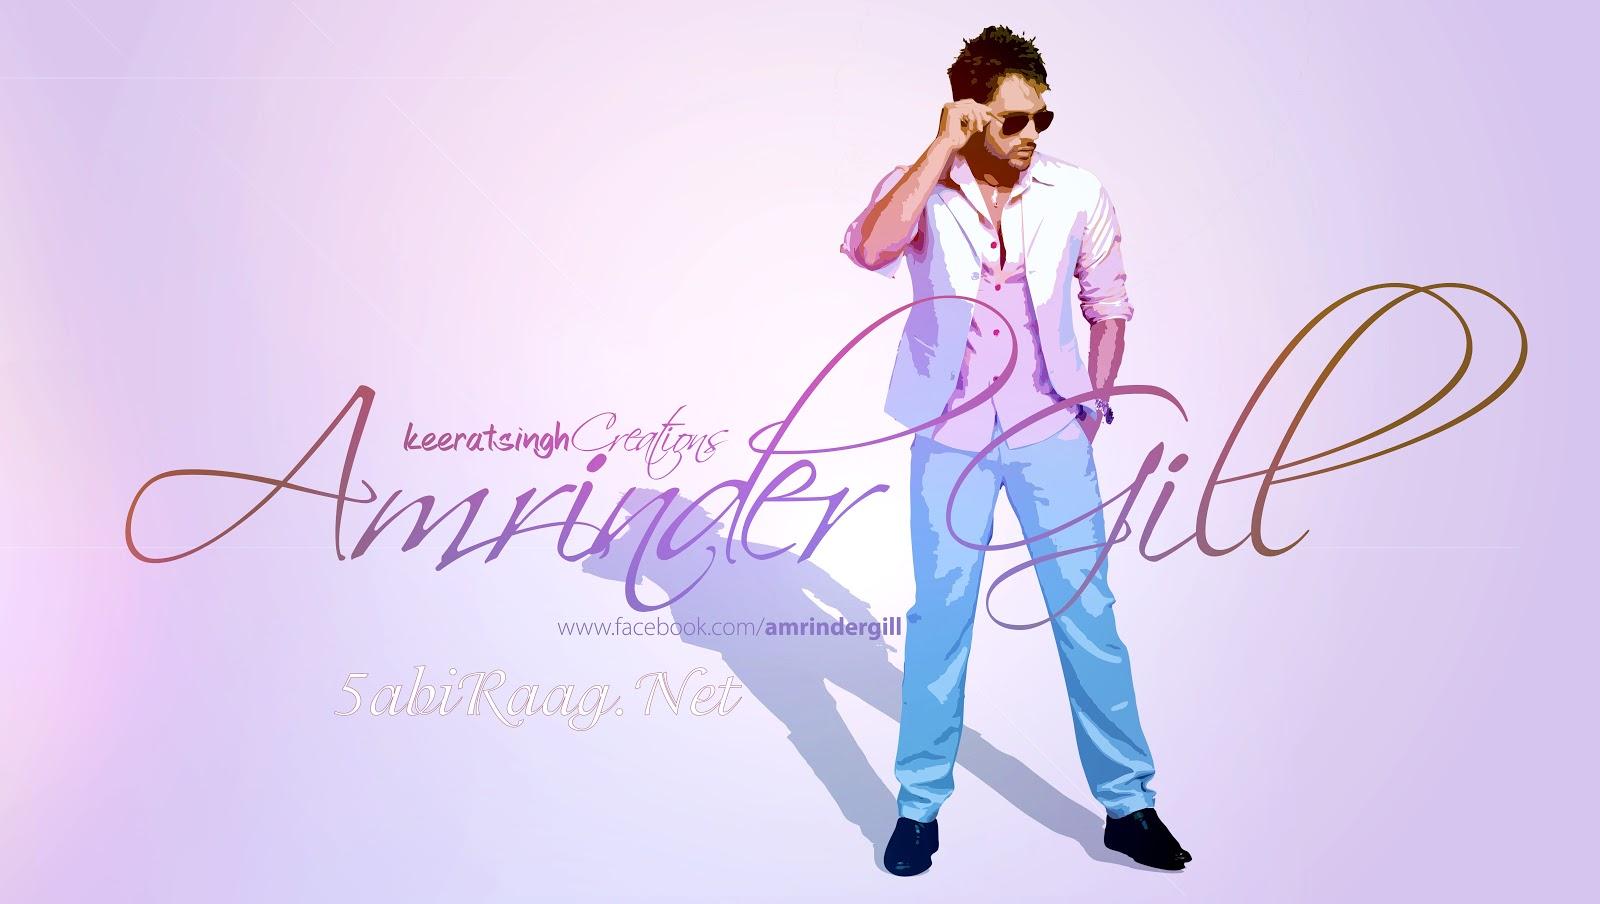 Amrinder Gill Punjabi Singer HD Wallpaper PoPoPicscom 1600x904